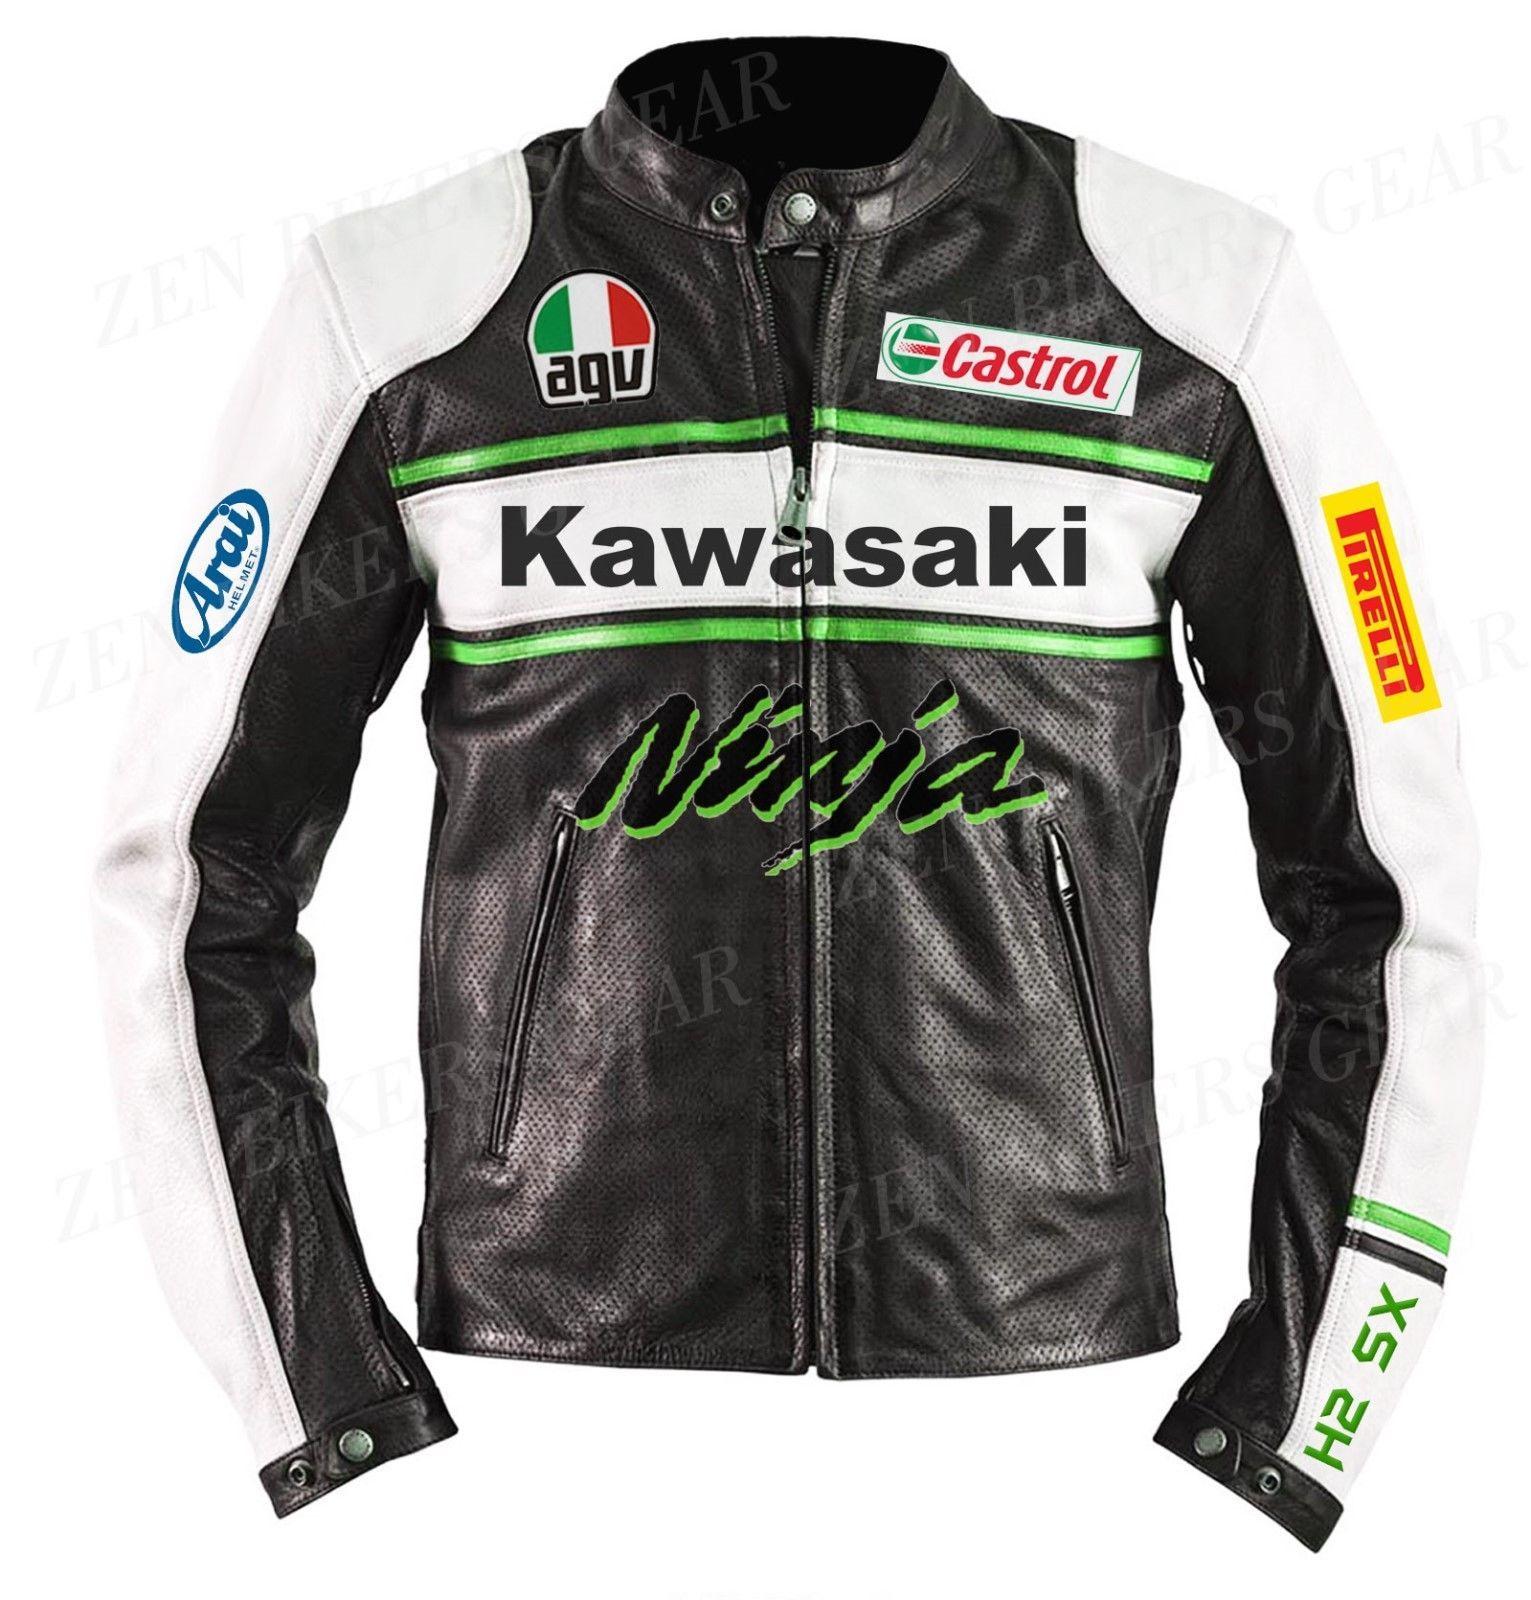 Black White Green Kawasaki Ninja Castrol Motocard Racing